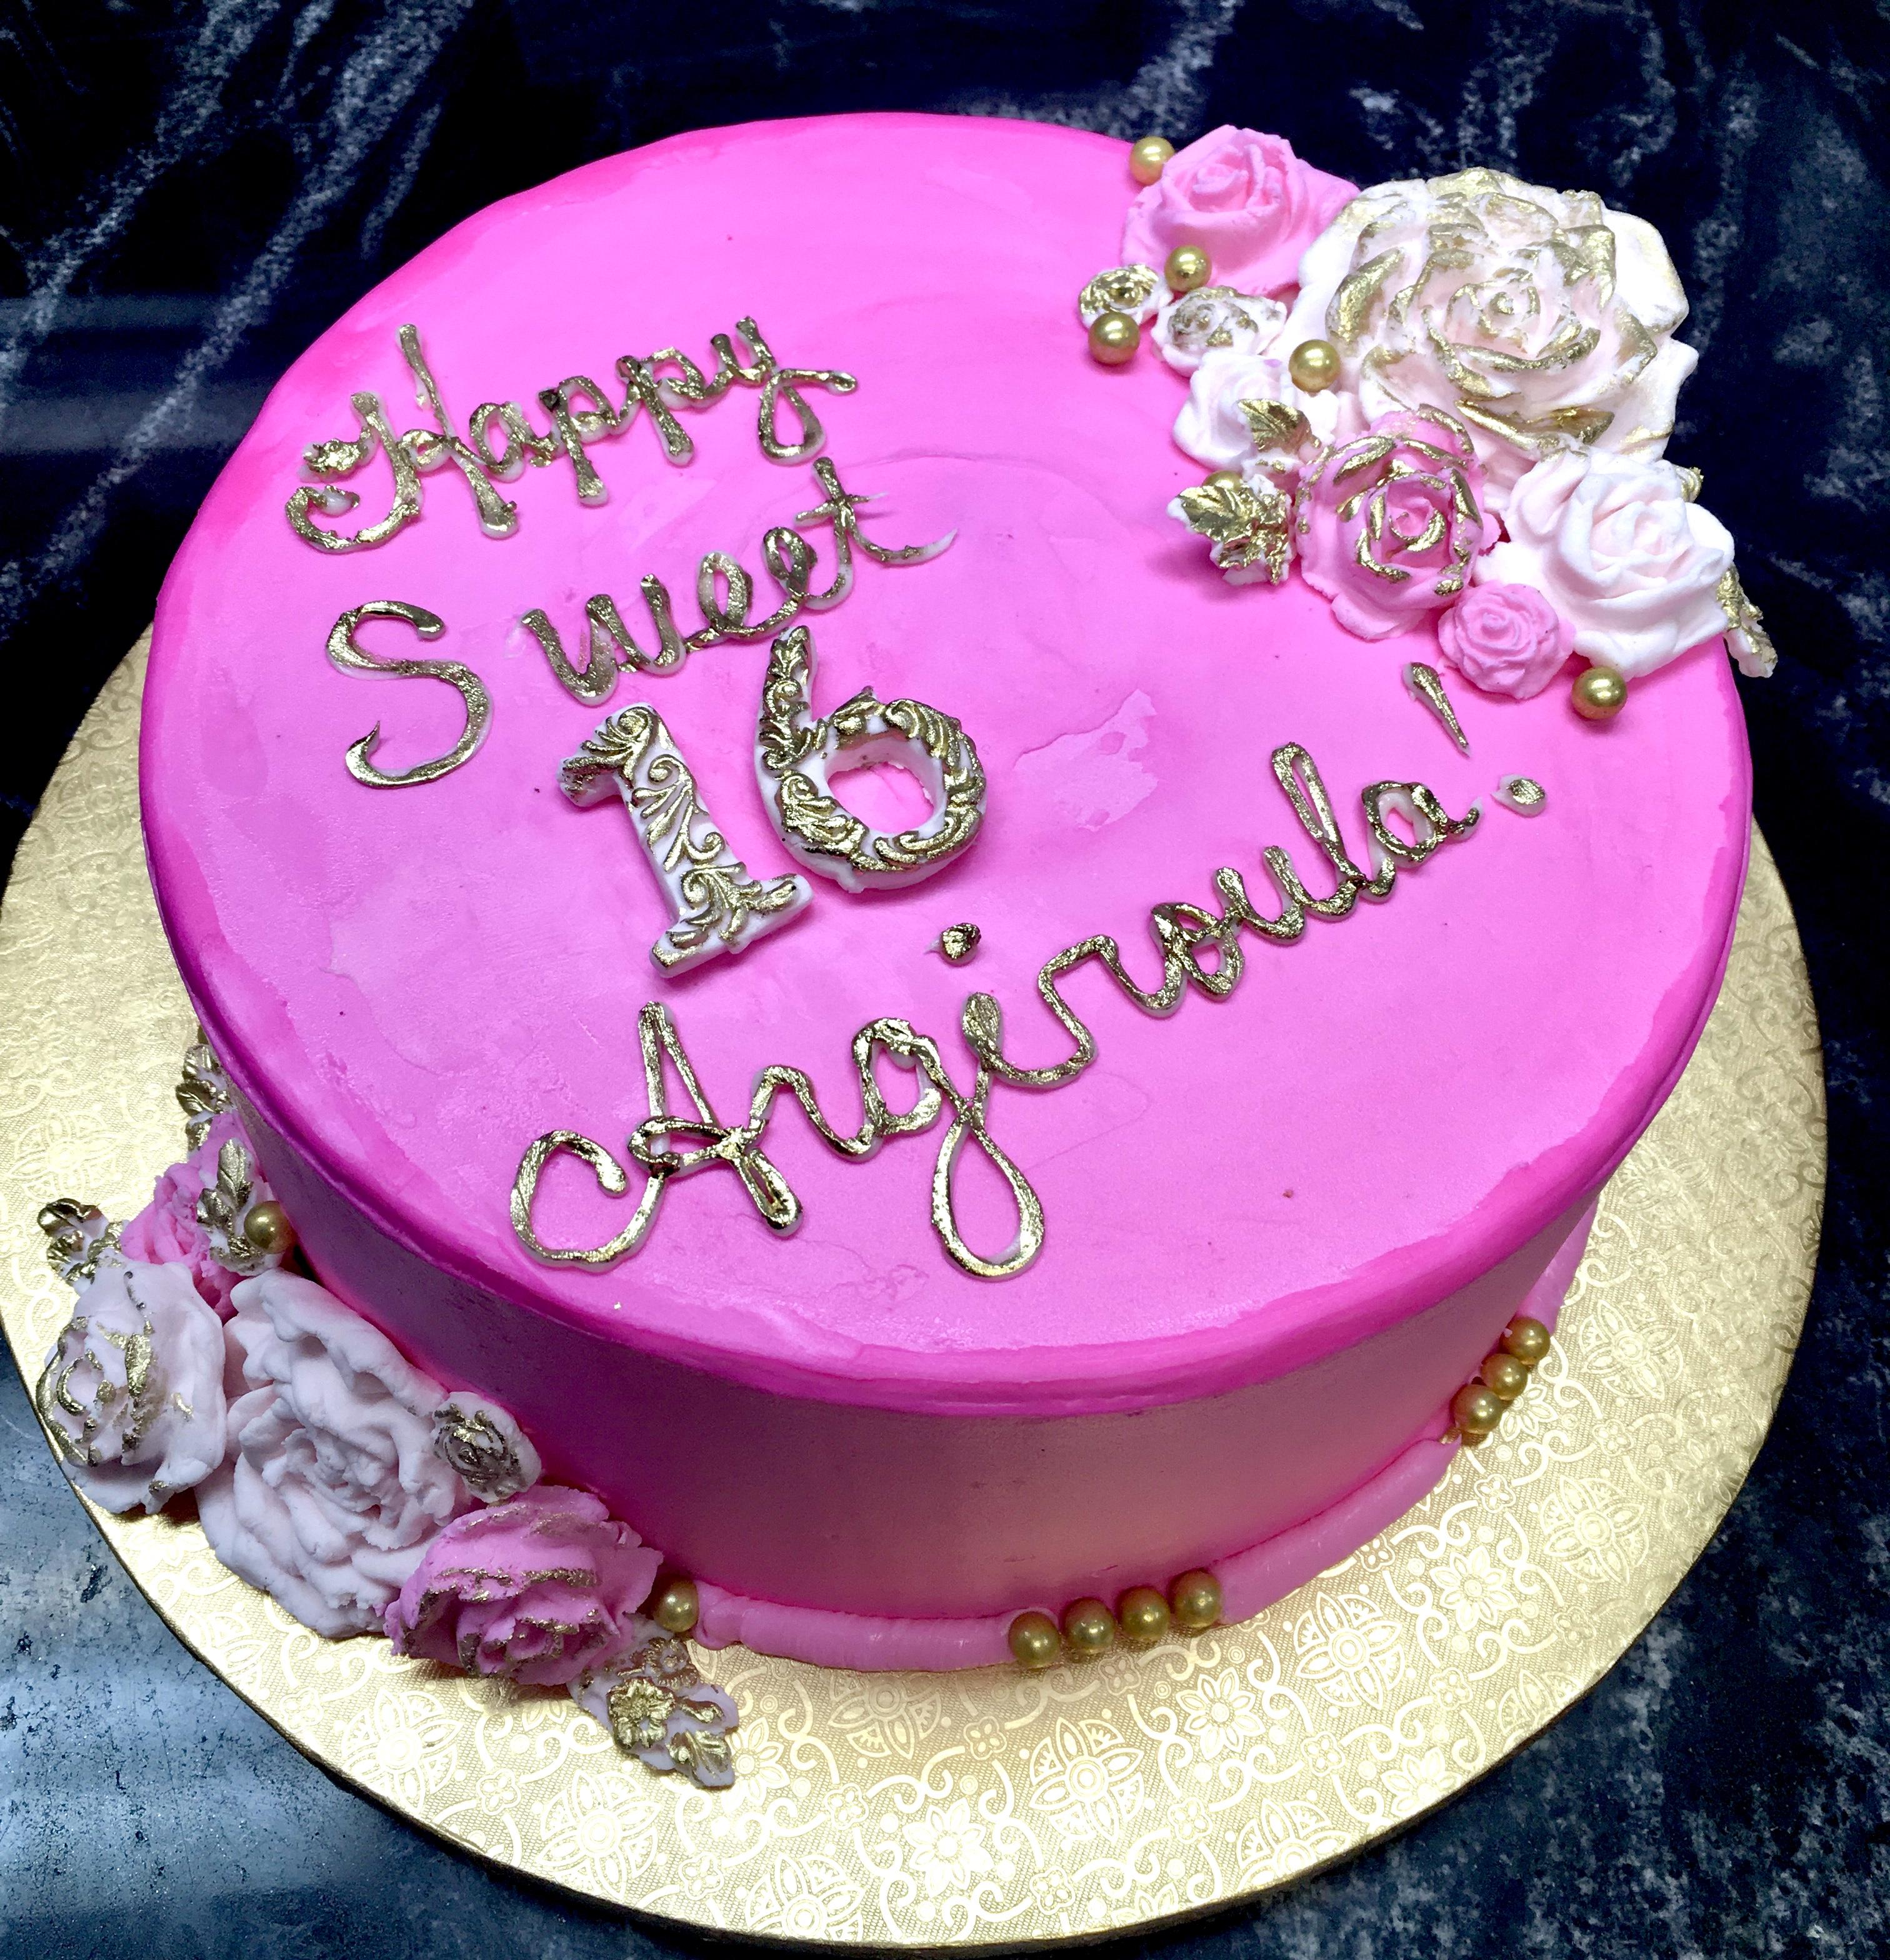 Pink & Gold Floral Cake